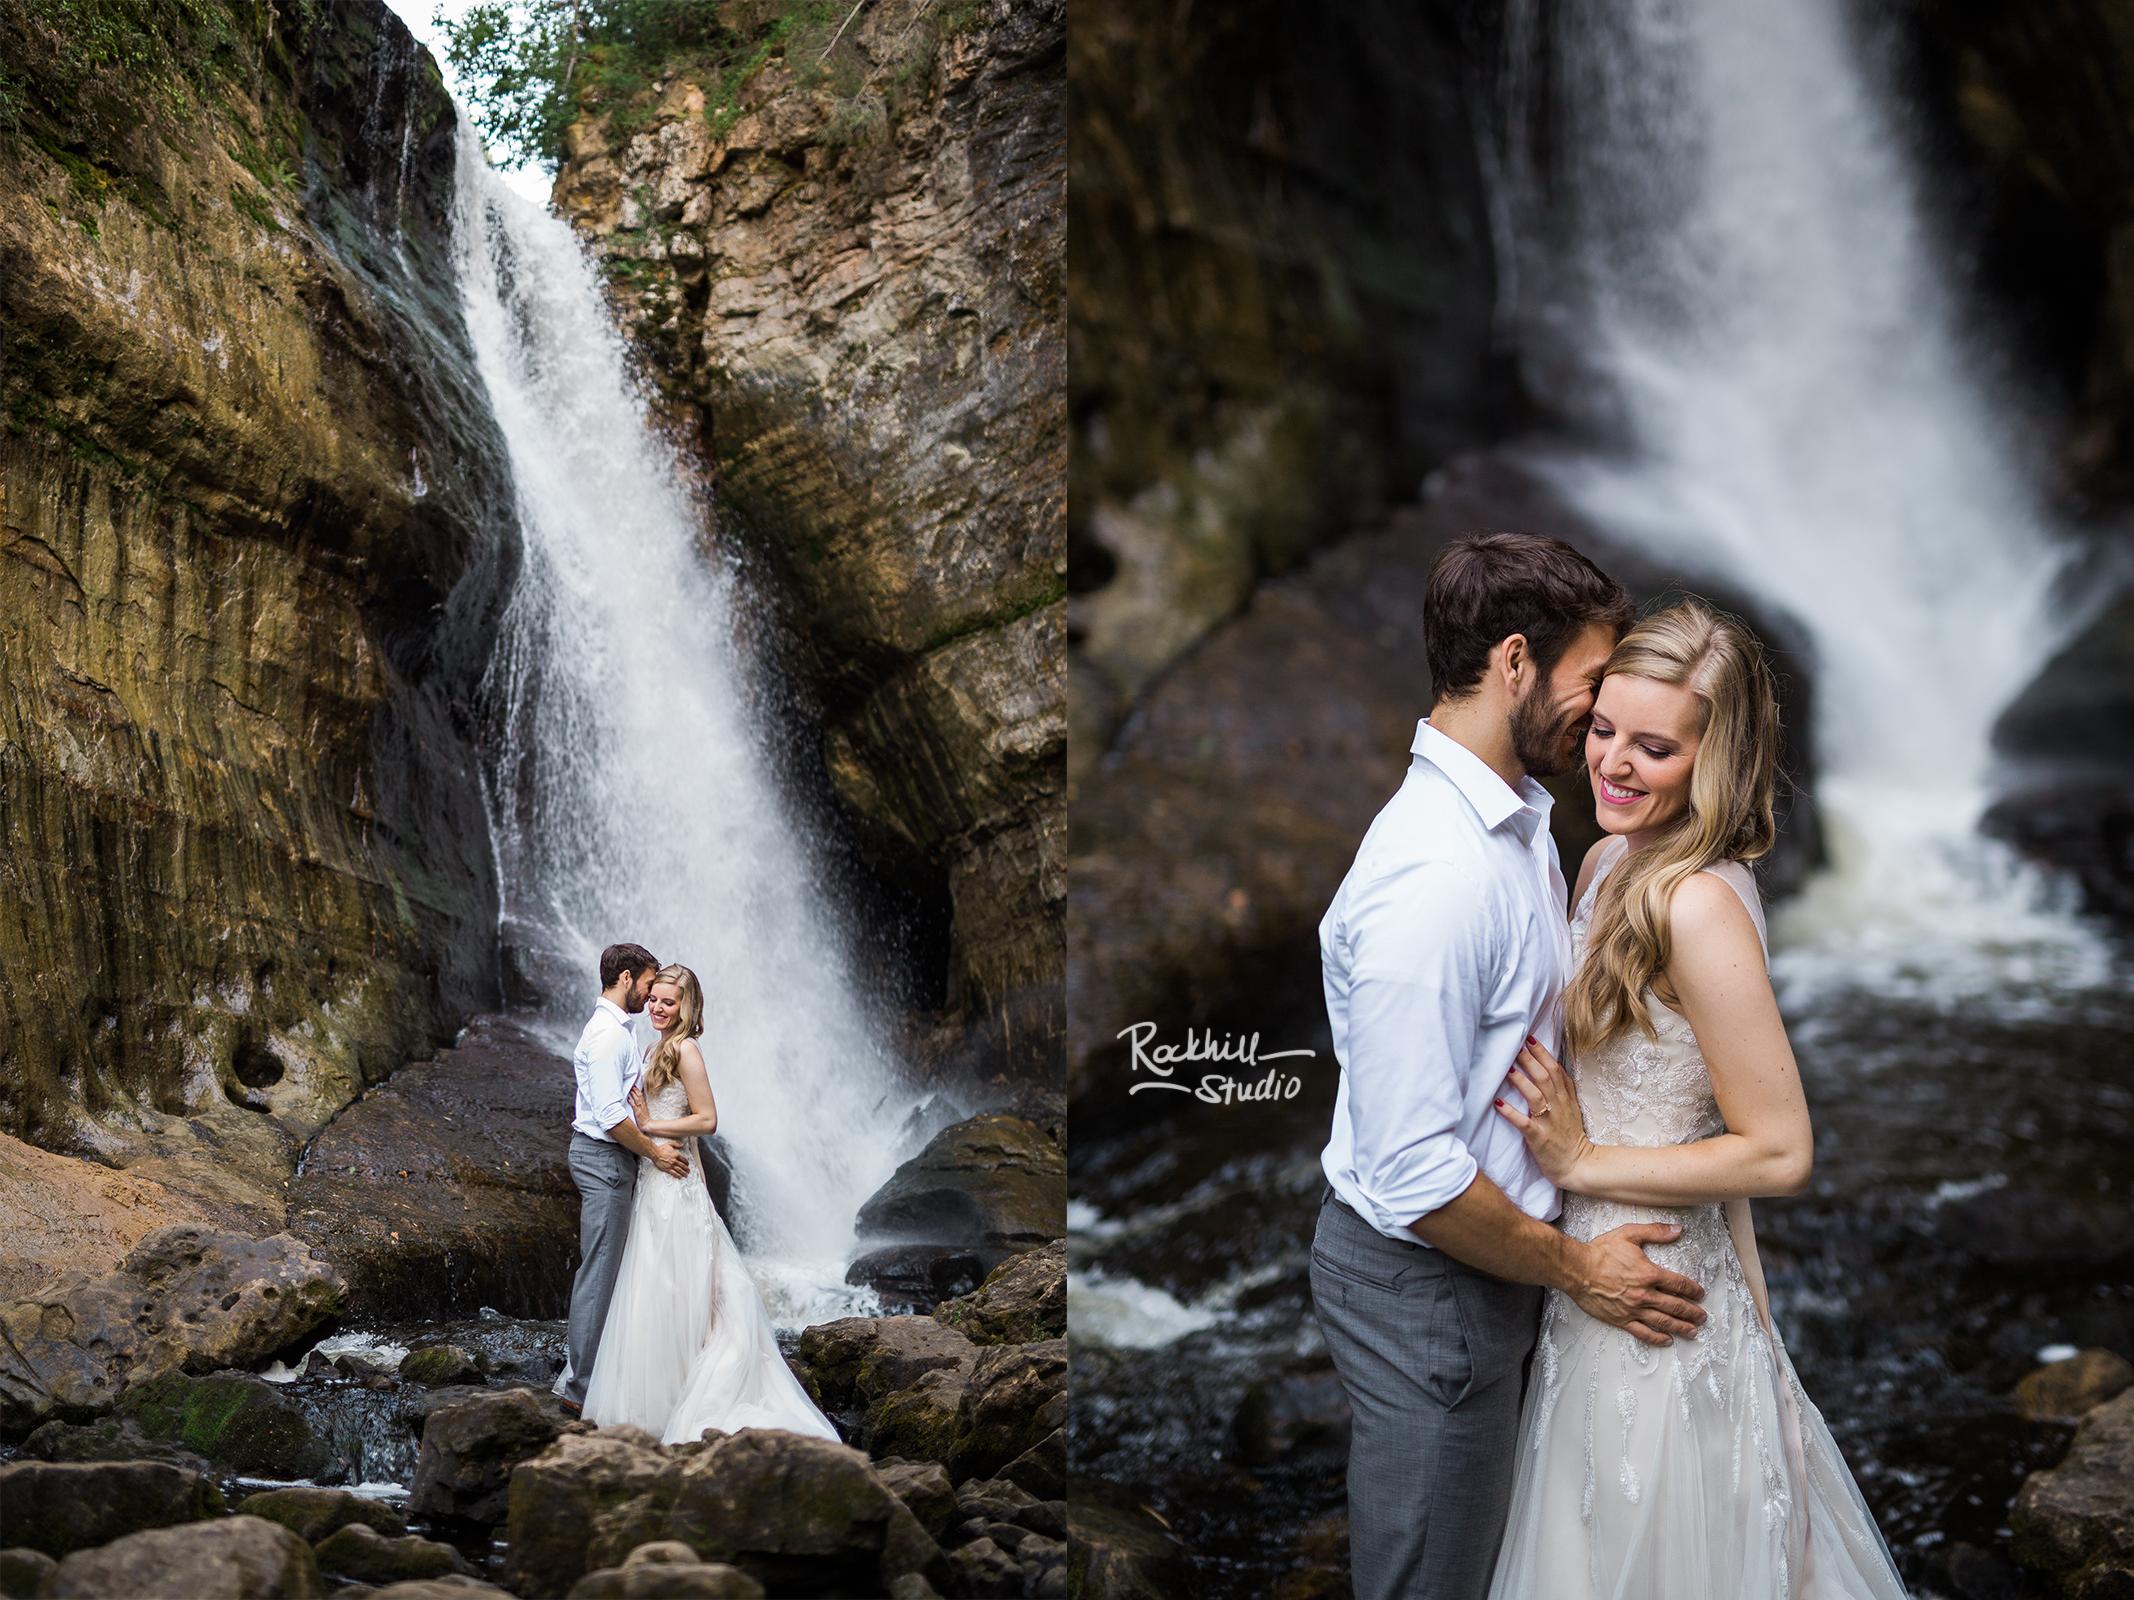 Northern Michigan Wedding Photographer Upper Peninsula Rockhill Studio Traverse City Marquette Michigan